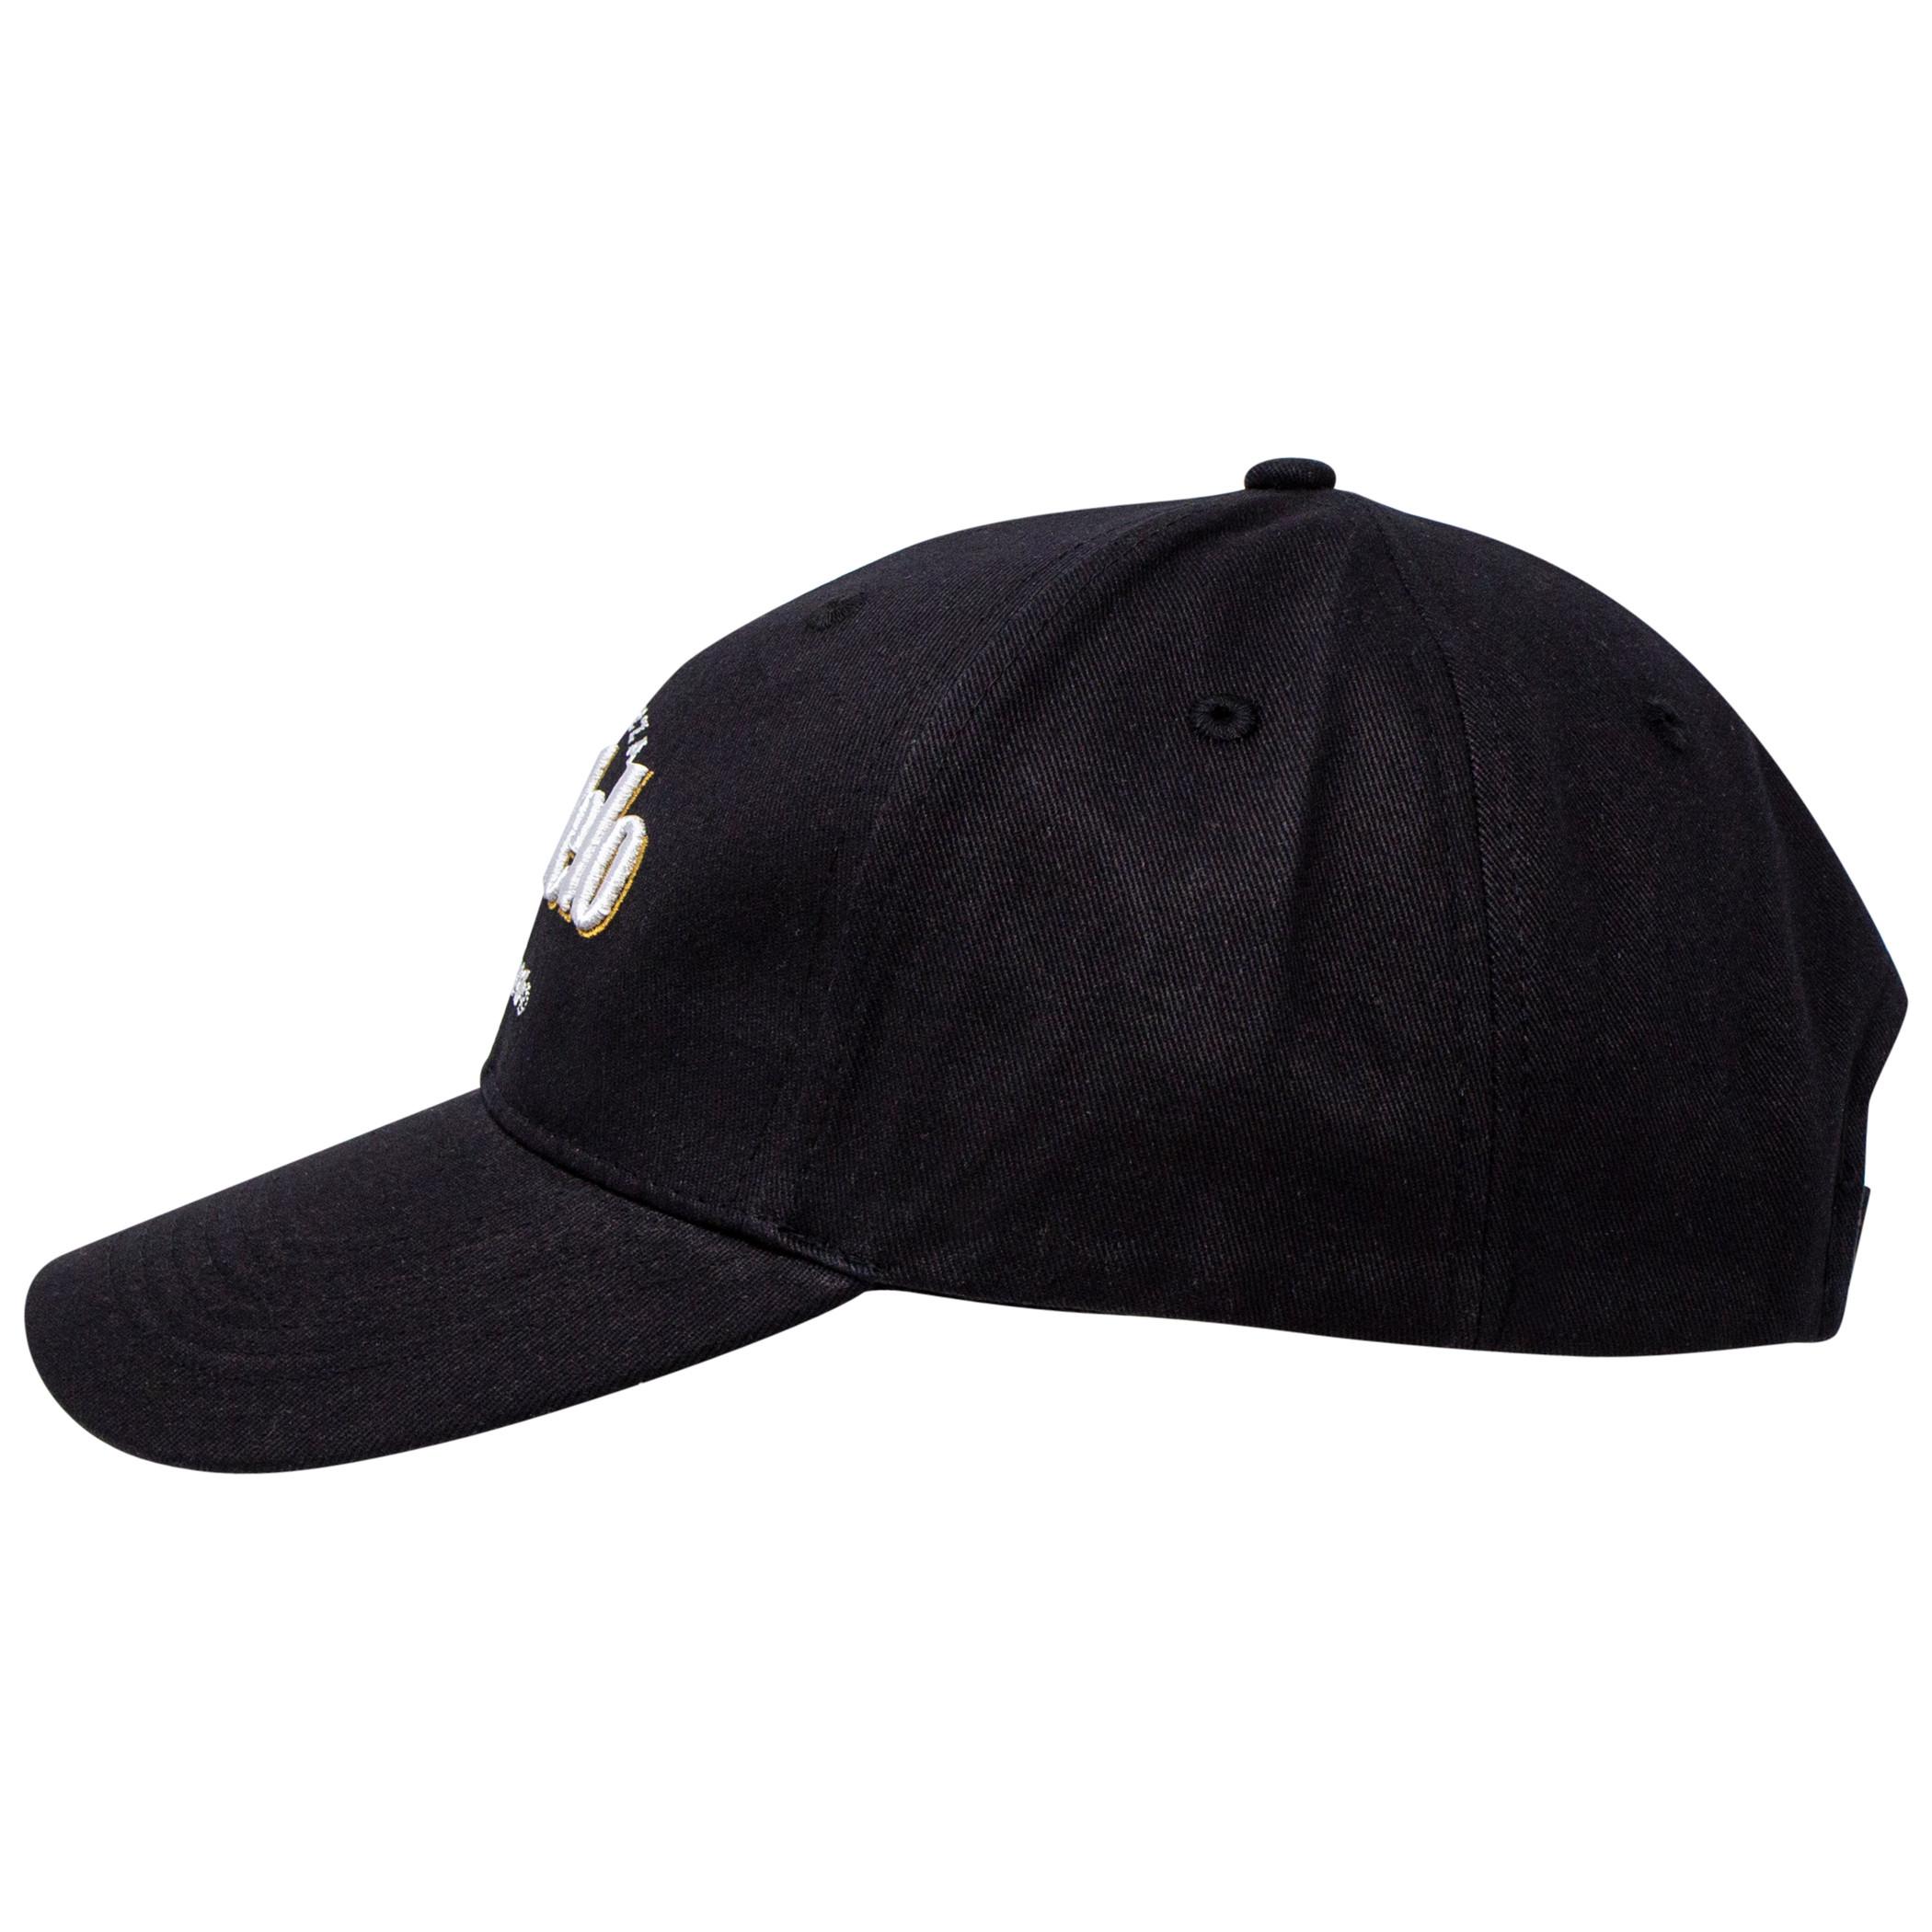 Modelo Negra Black and White Adjustable Strapback Hat